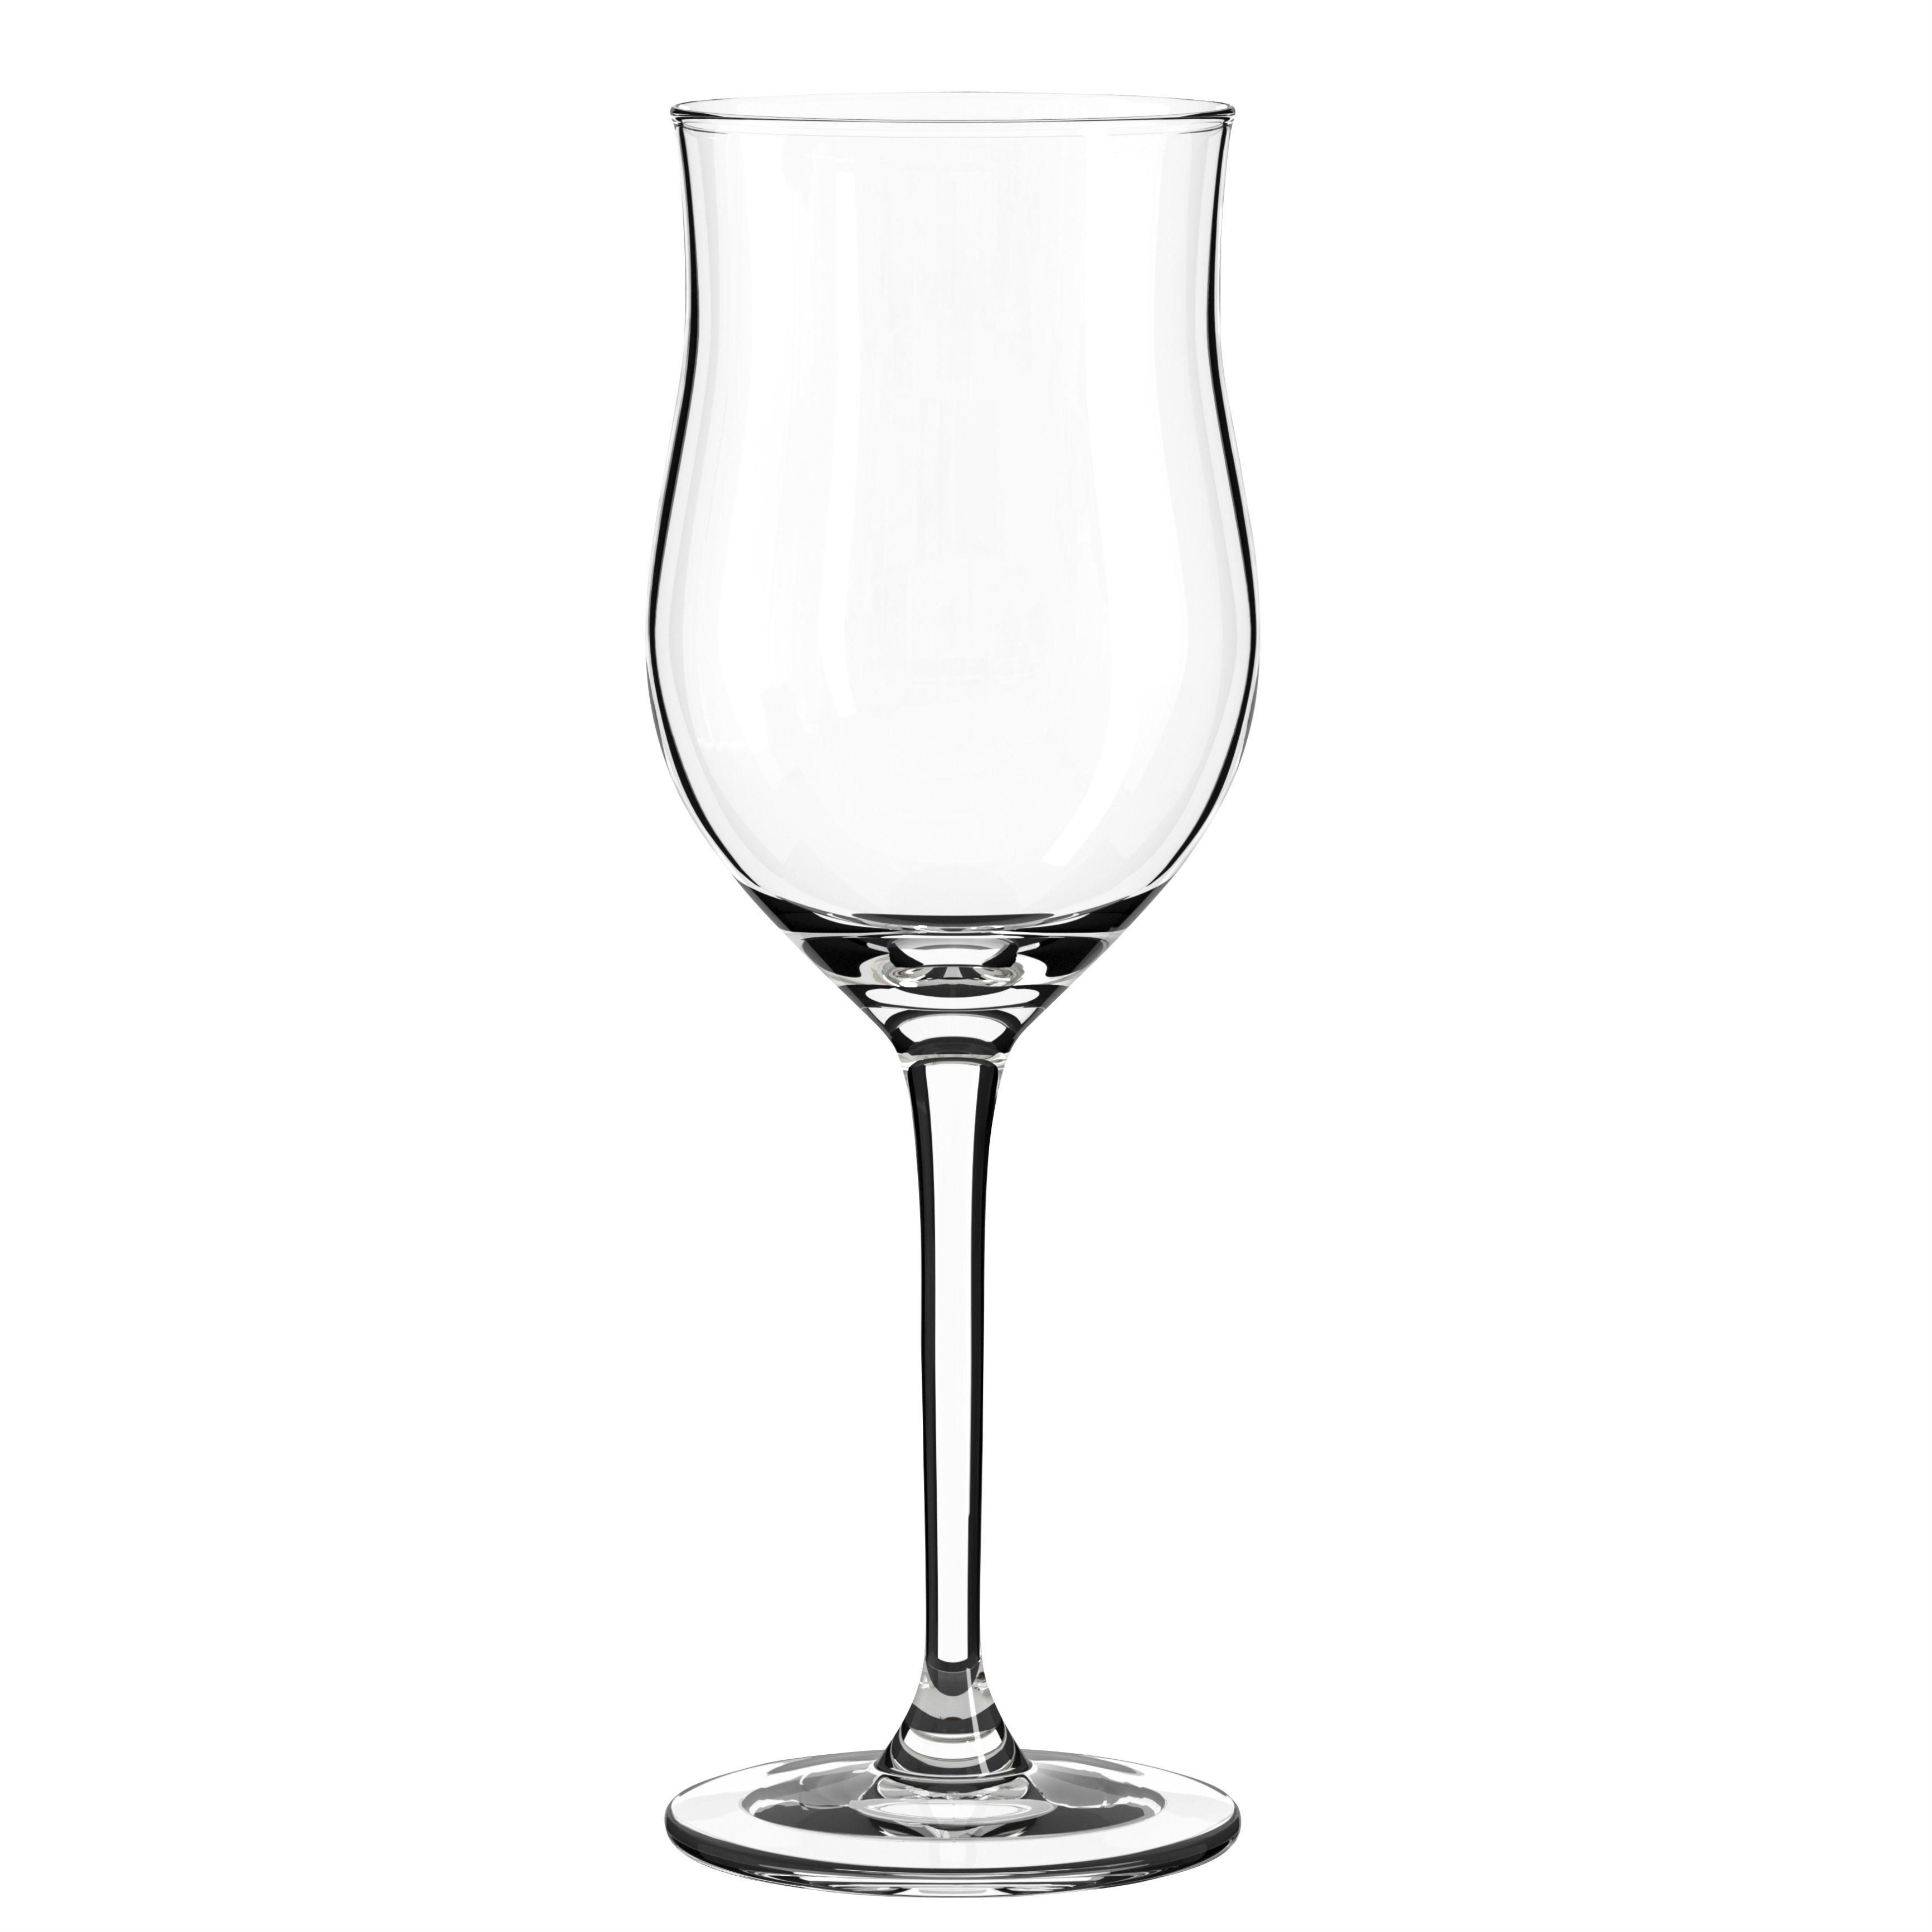 verre a vin collection hederlig ikea 1 49 une table chic elle